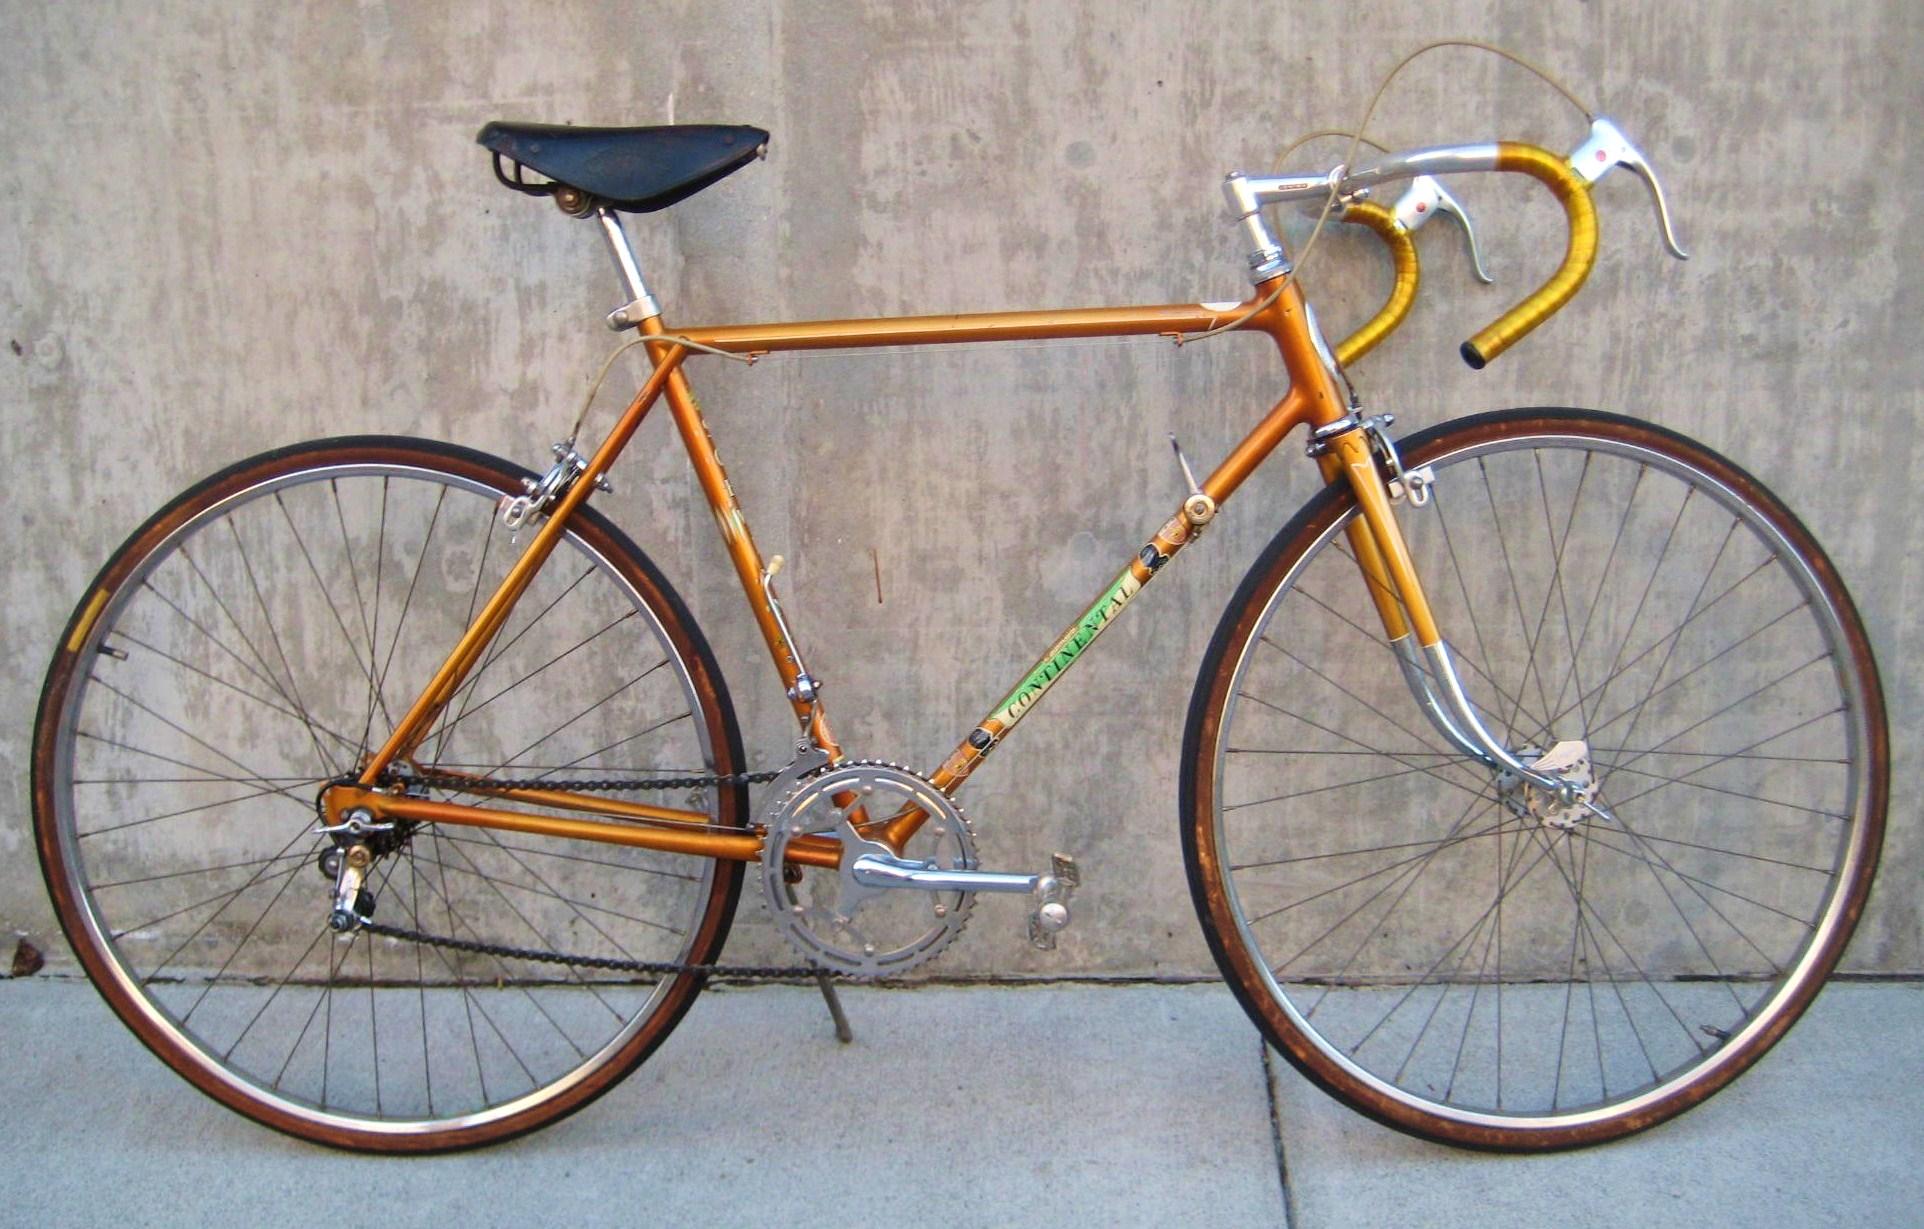 1960 Schwinn Continental At Classic Cycle Bainbridge